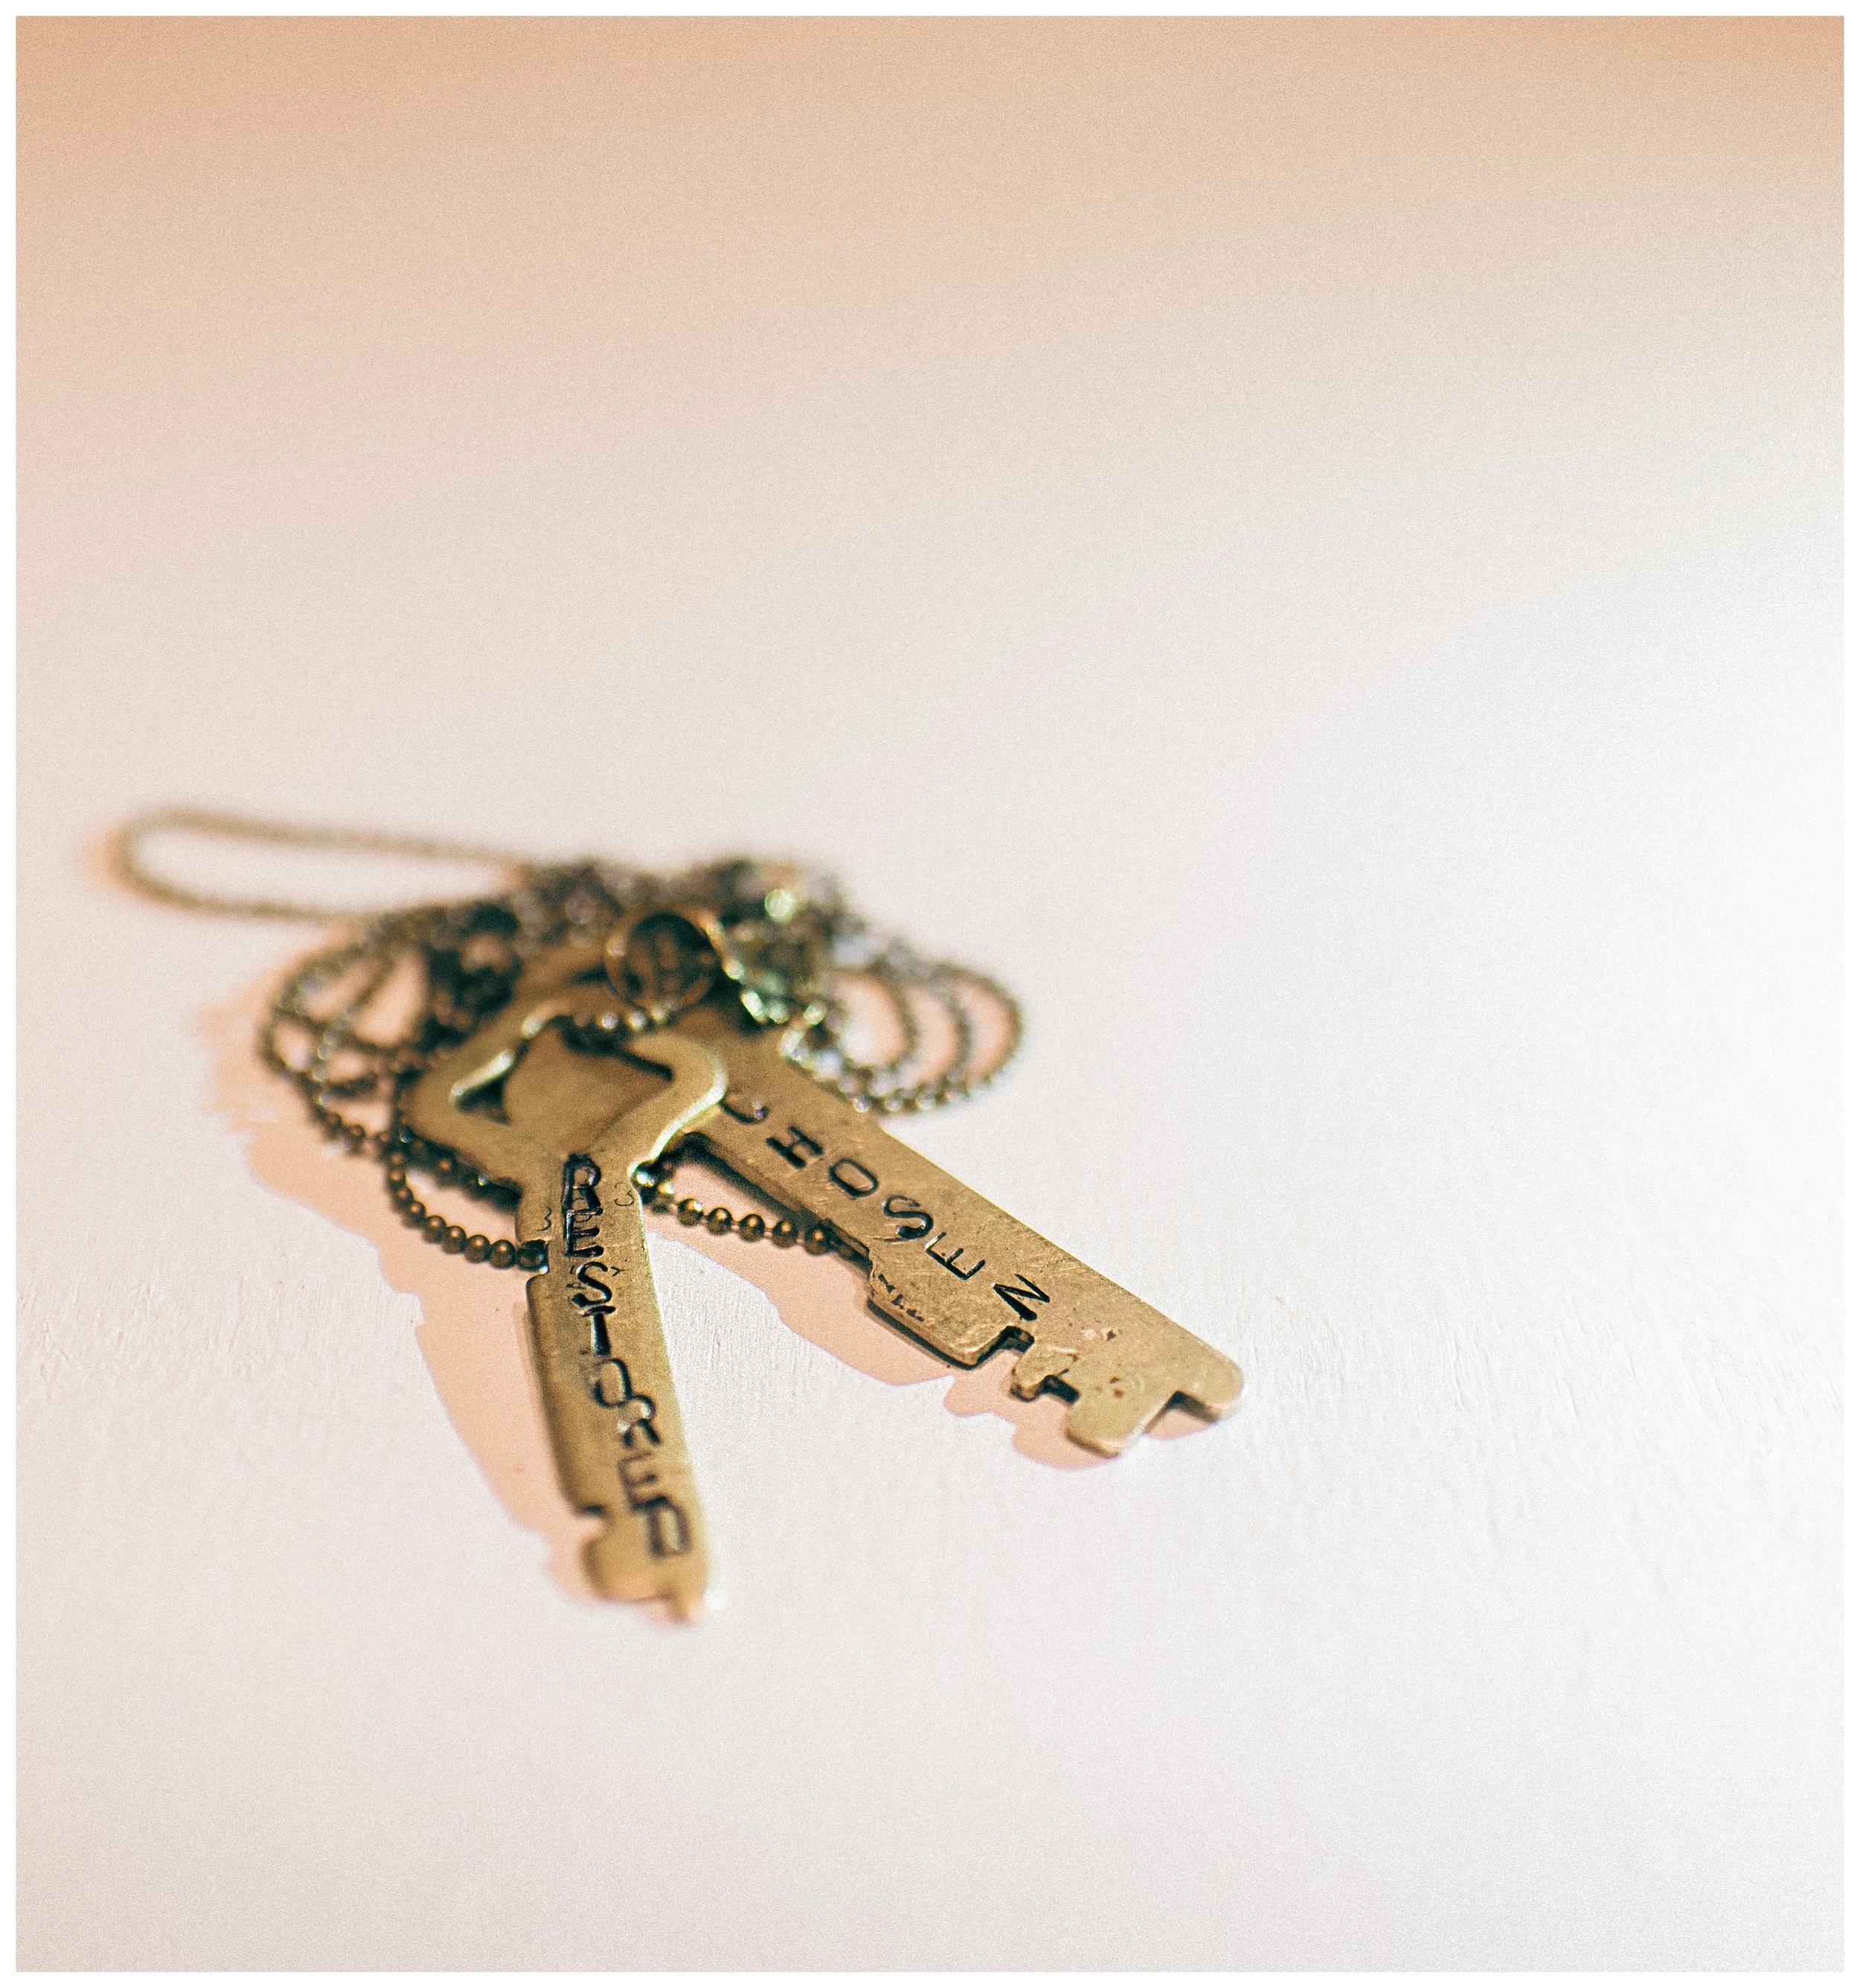 Restored Key | Chosen Key | Fostered Purpose